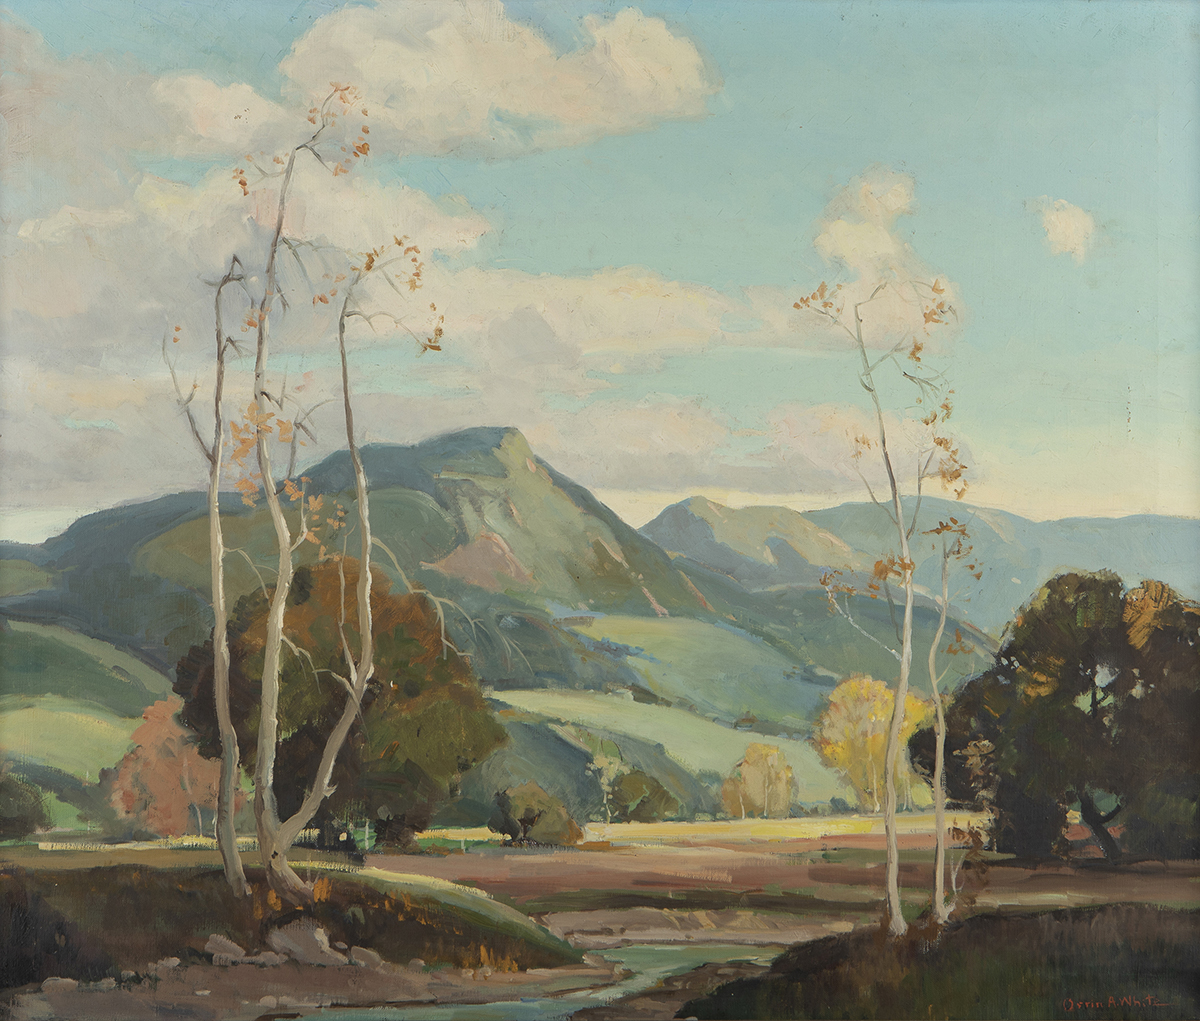 Orrin A. White, (1883-1969 Pasadena, CA)